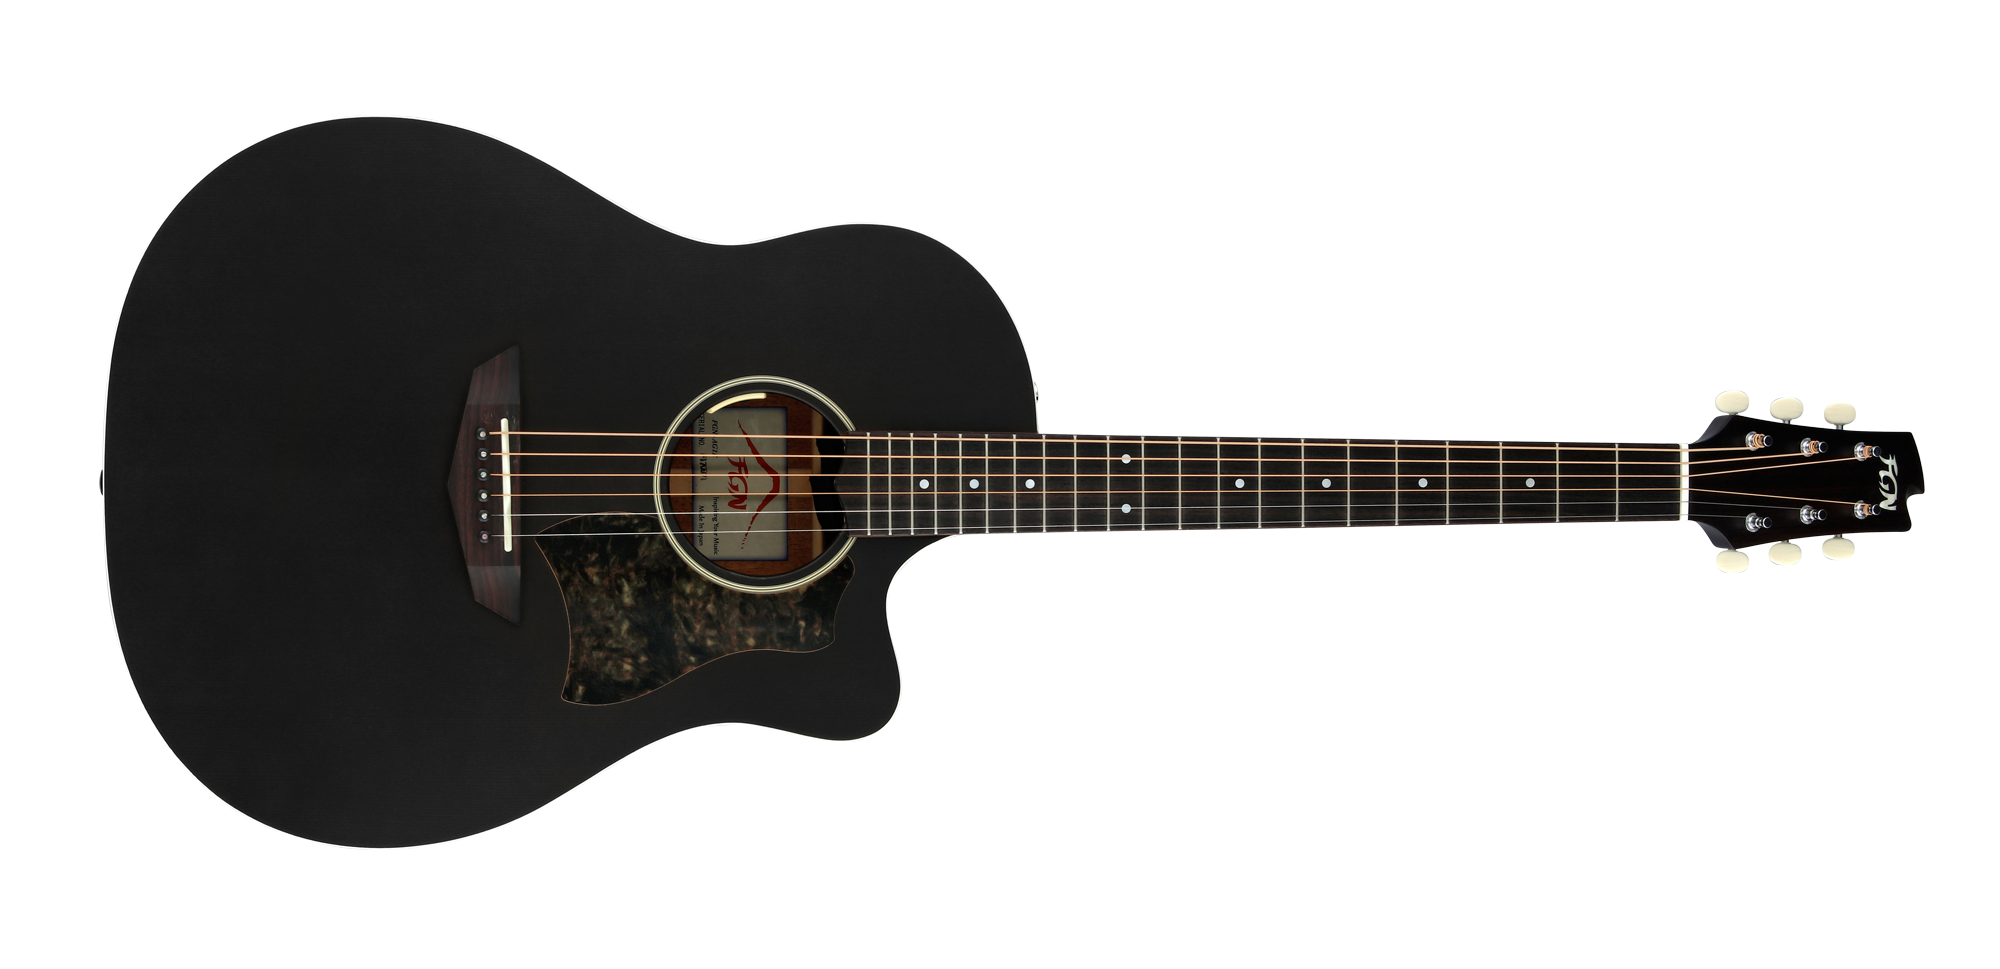 FGN Westerngitarre, AG1E, Transparent Black Flat, Preamp, Tasche